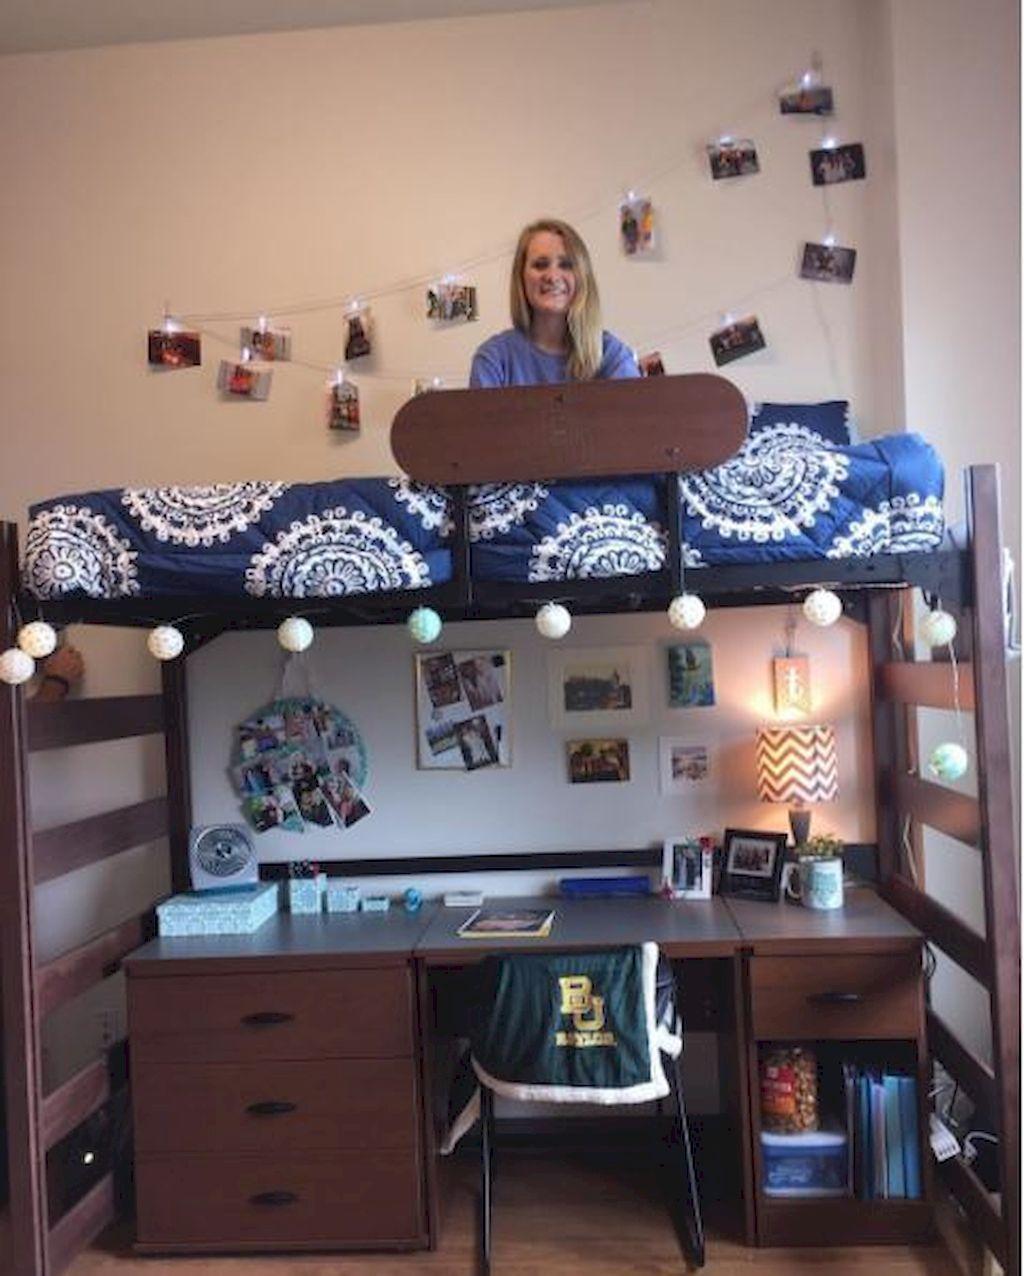 Stunning 75 Genius Dorm Room Organization Ideas